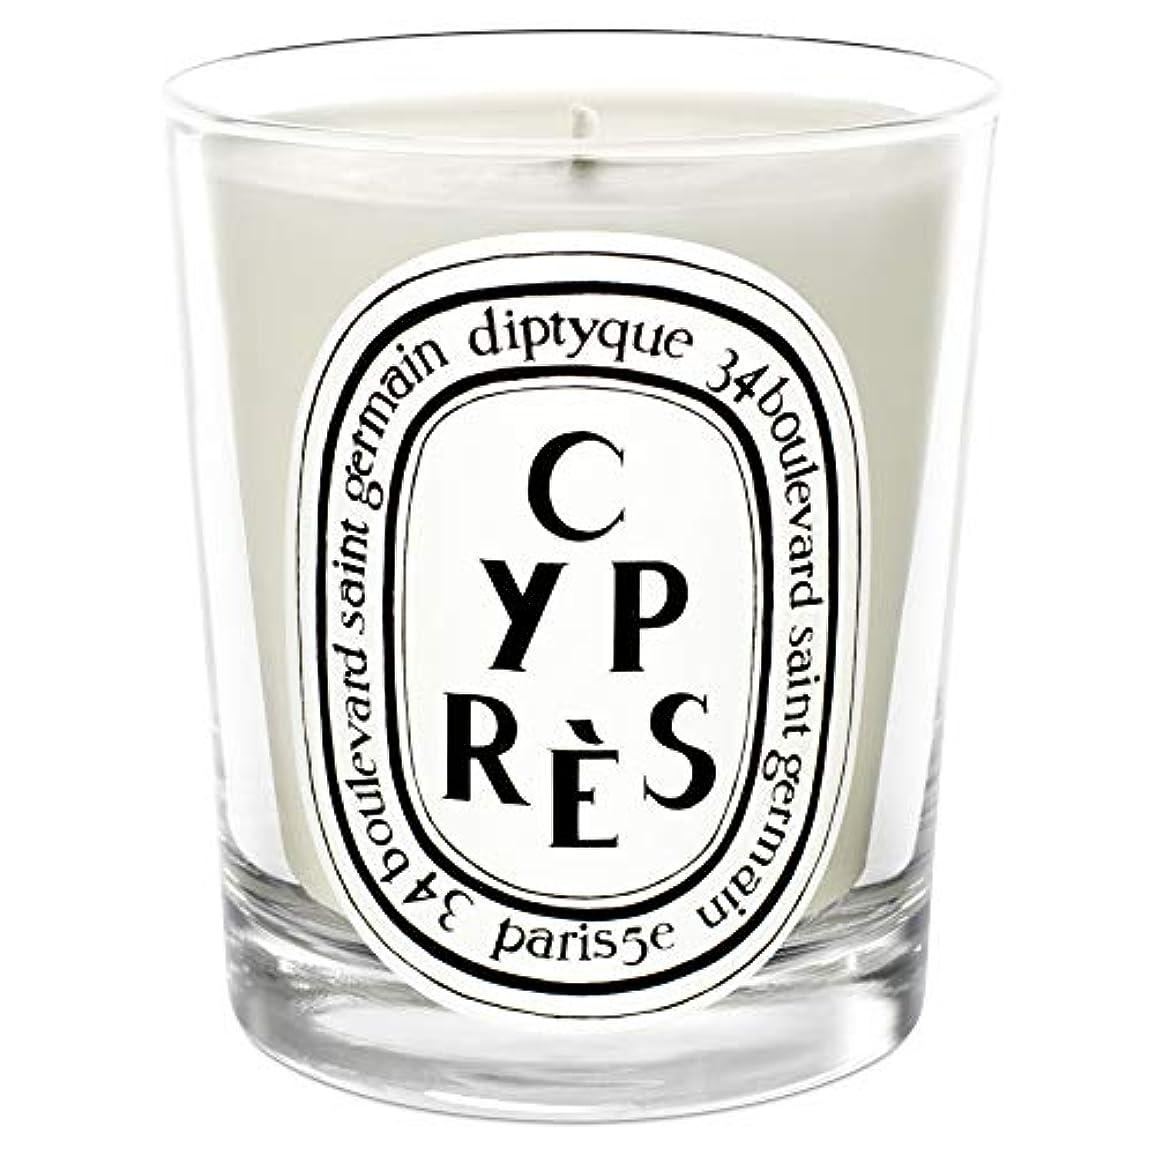 [Diptyque] DiptyqueのCypr?s香りのキャンドル190グラム - Diptyque Cypr?s Scented Candle 190g [並行輸入品]